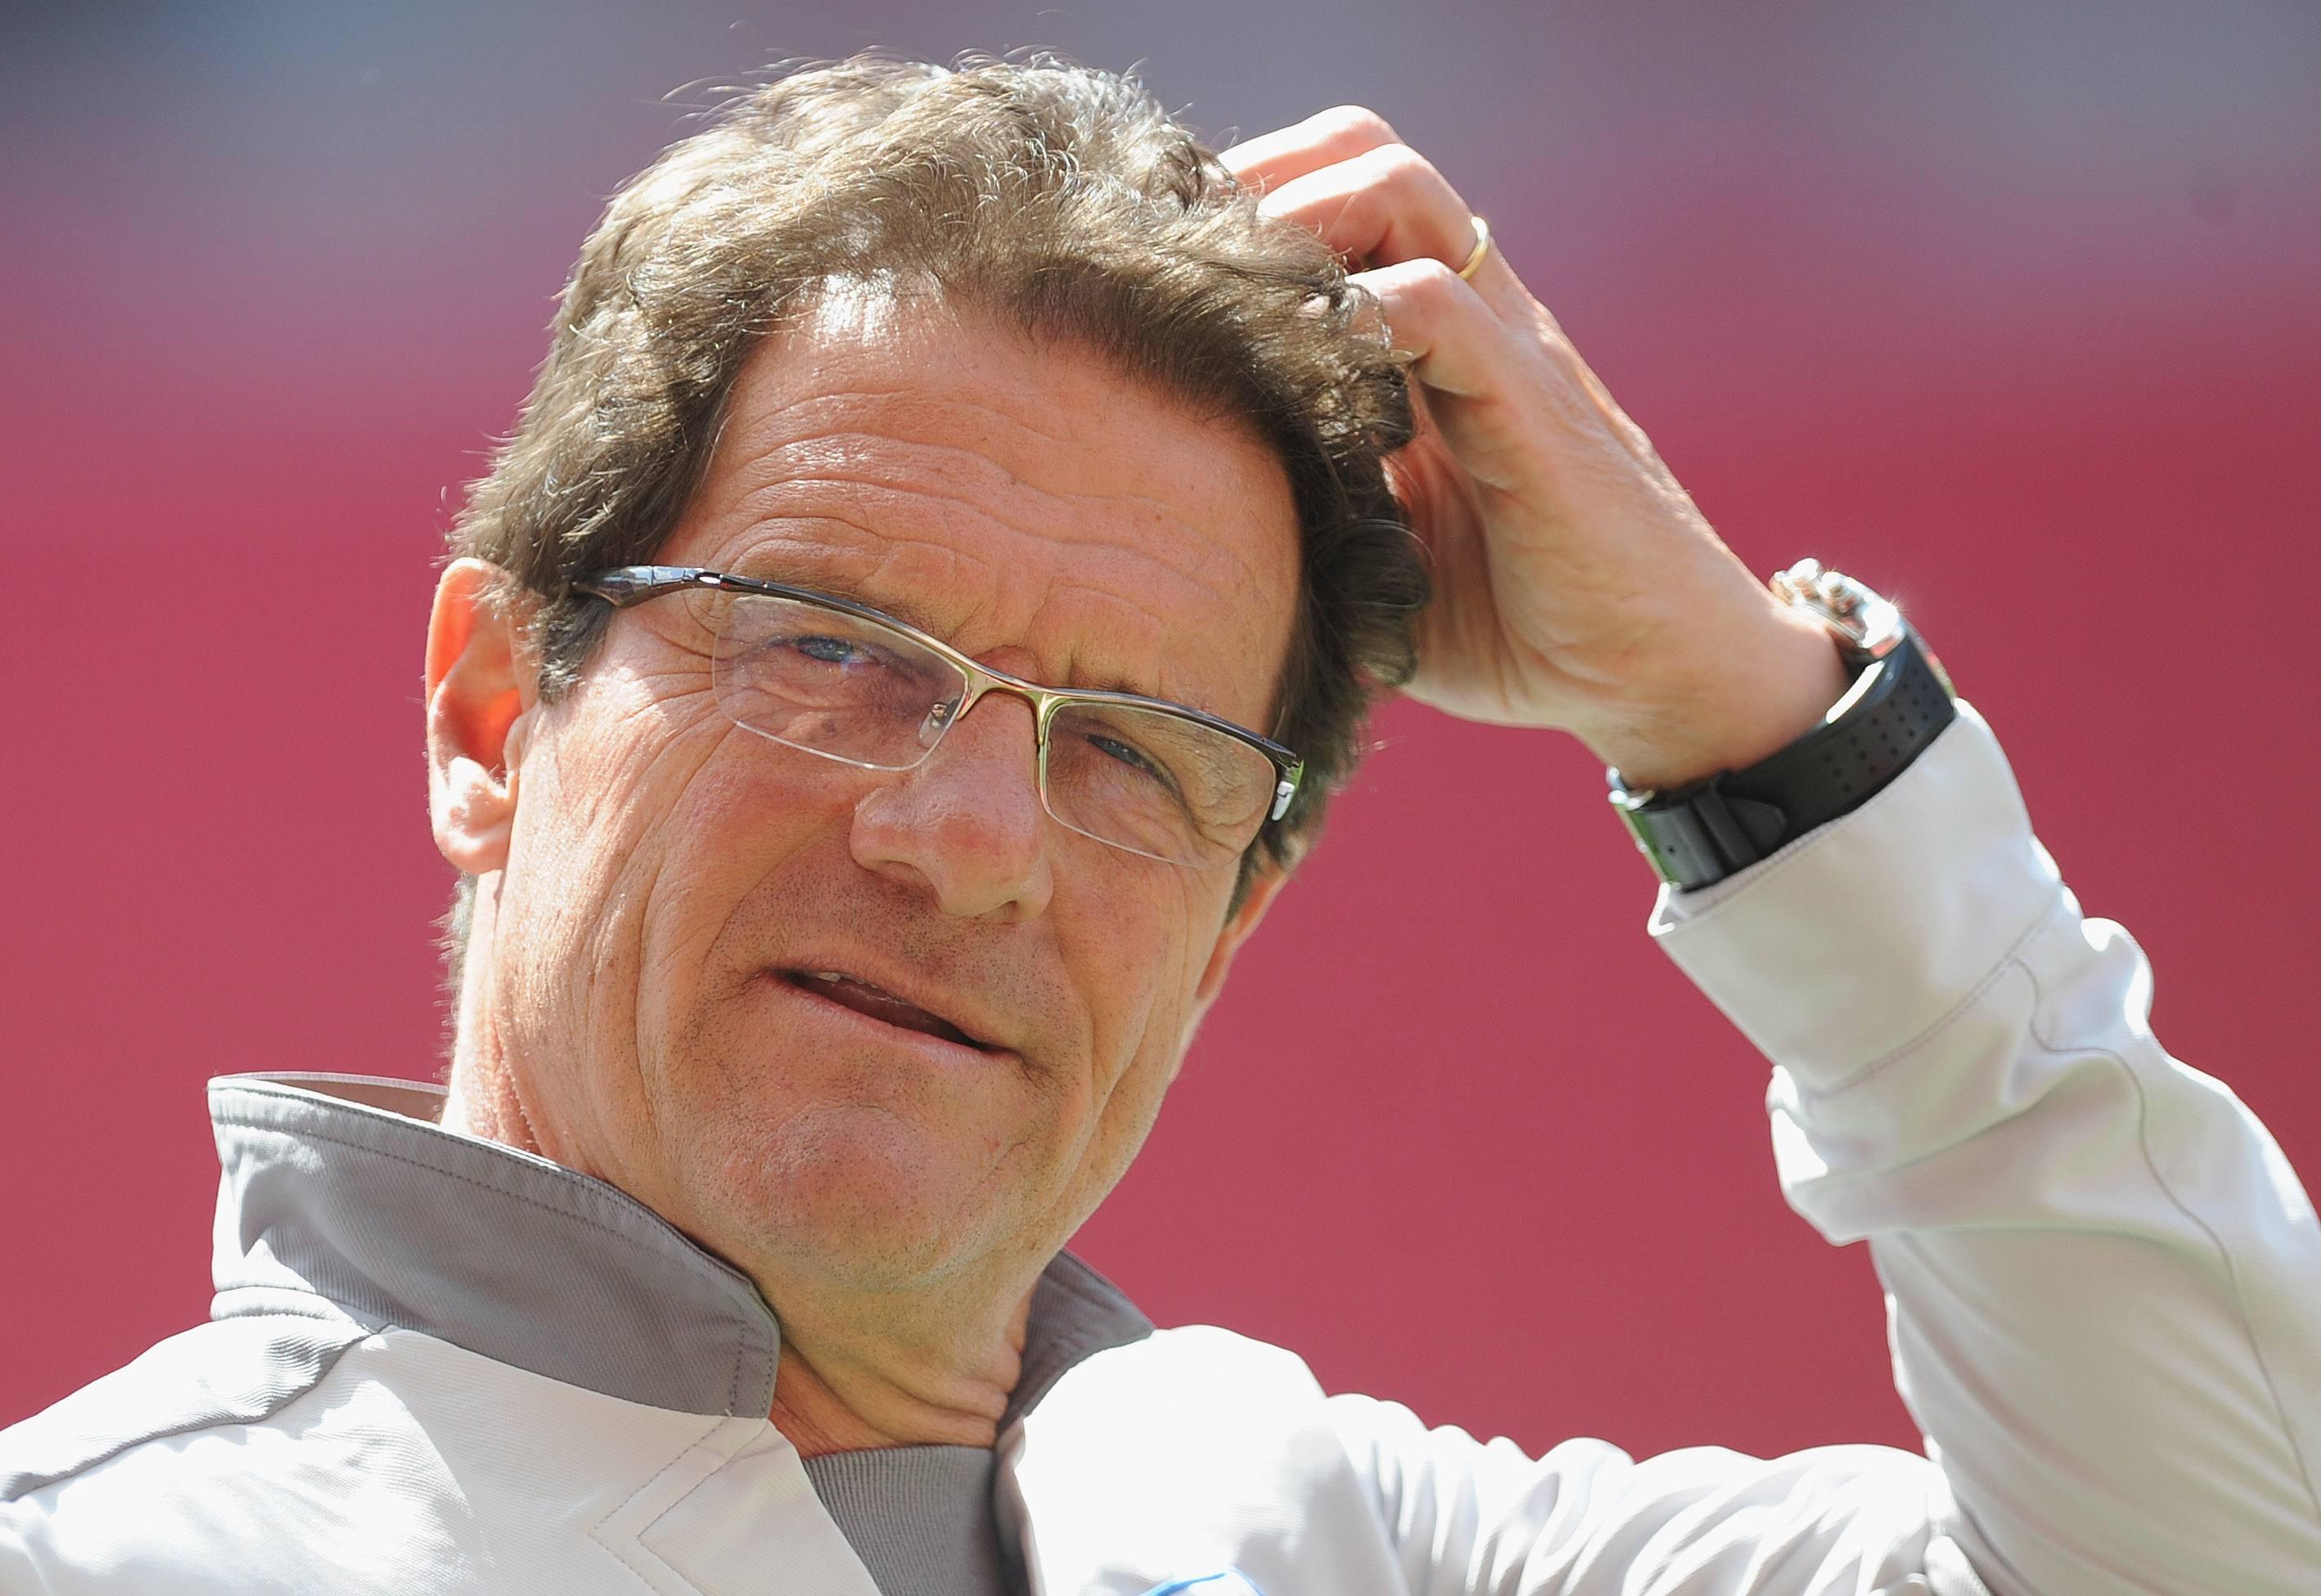 England manager Fabio Capello scratches his head